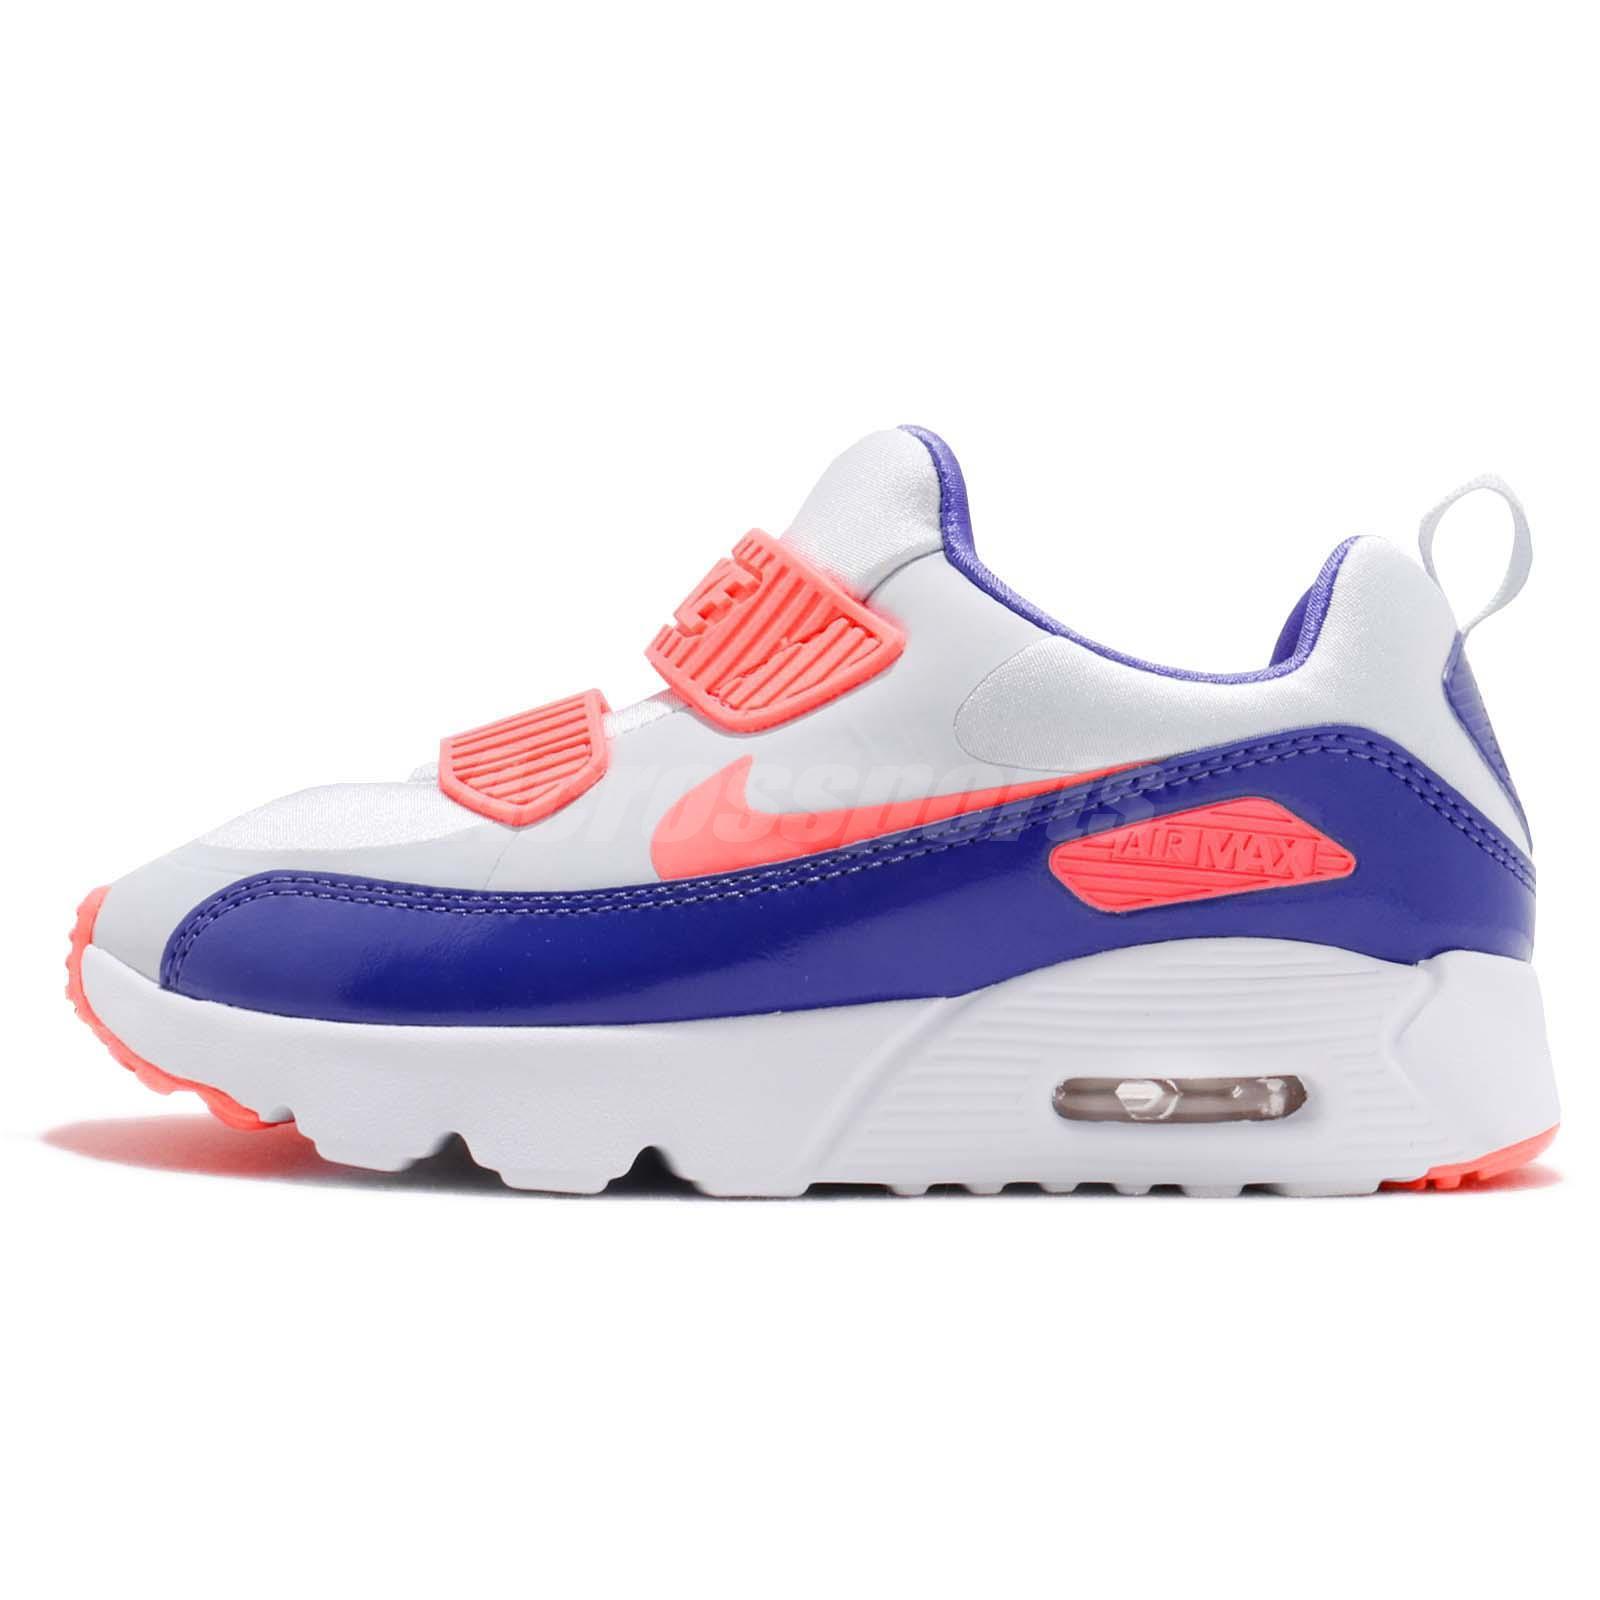 new product 7e3a3 139b6 Nike Air Max Tiny 90 PS Pure Platinum Lava Glow Kid Preschool Shoes  881926-005